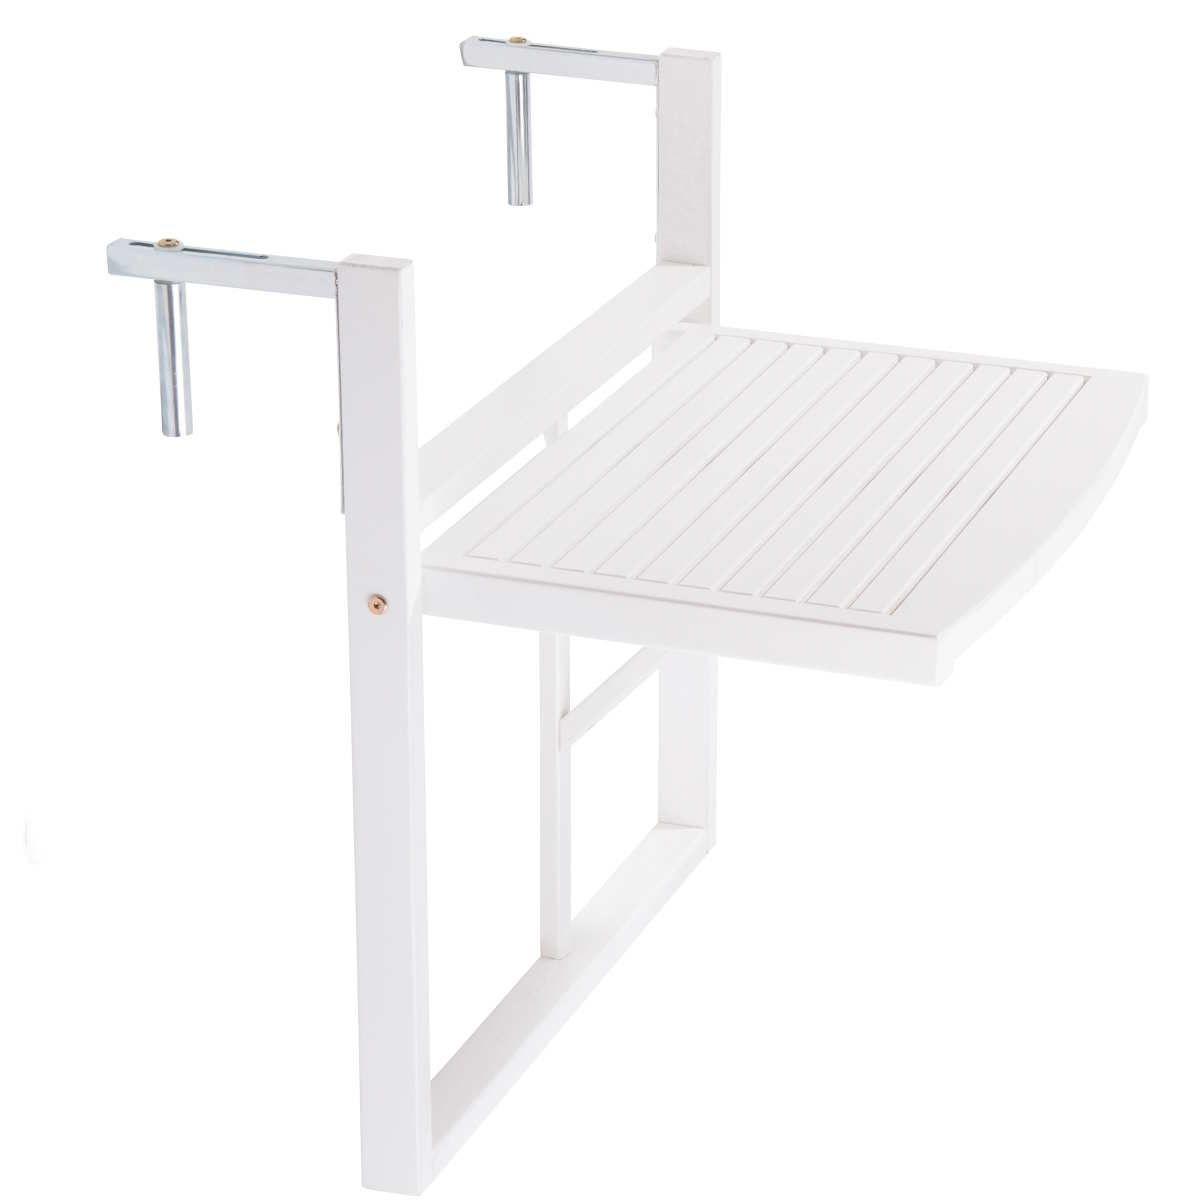 Butlers Onlineshop Lodge Folding Table For Balcony Railings Klapptisch Klapptisch Holz Mobel Fur Kleine Raume